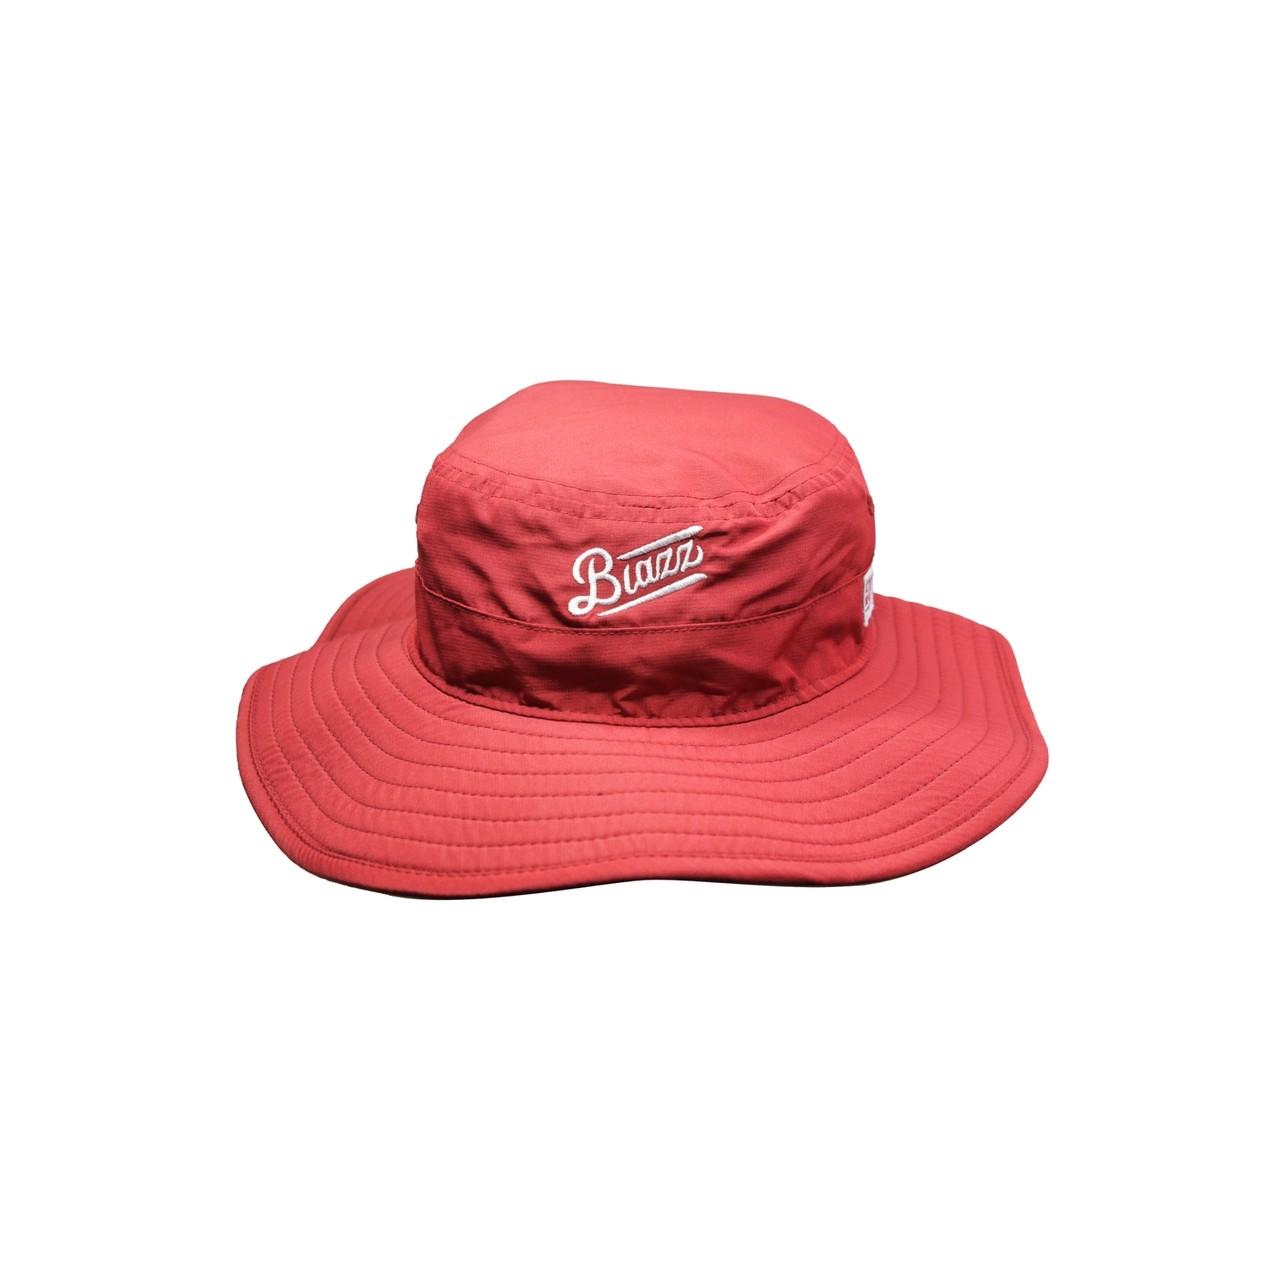 LOGO CAMP BOONEY [RED]